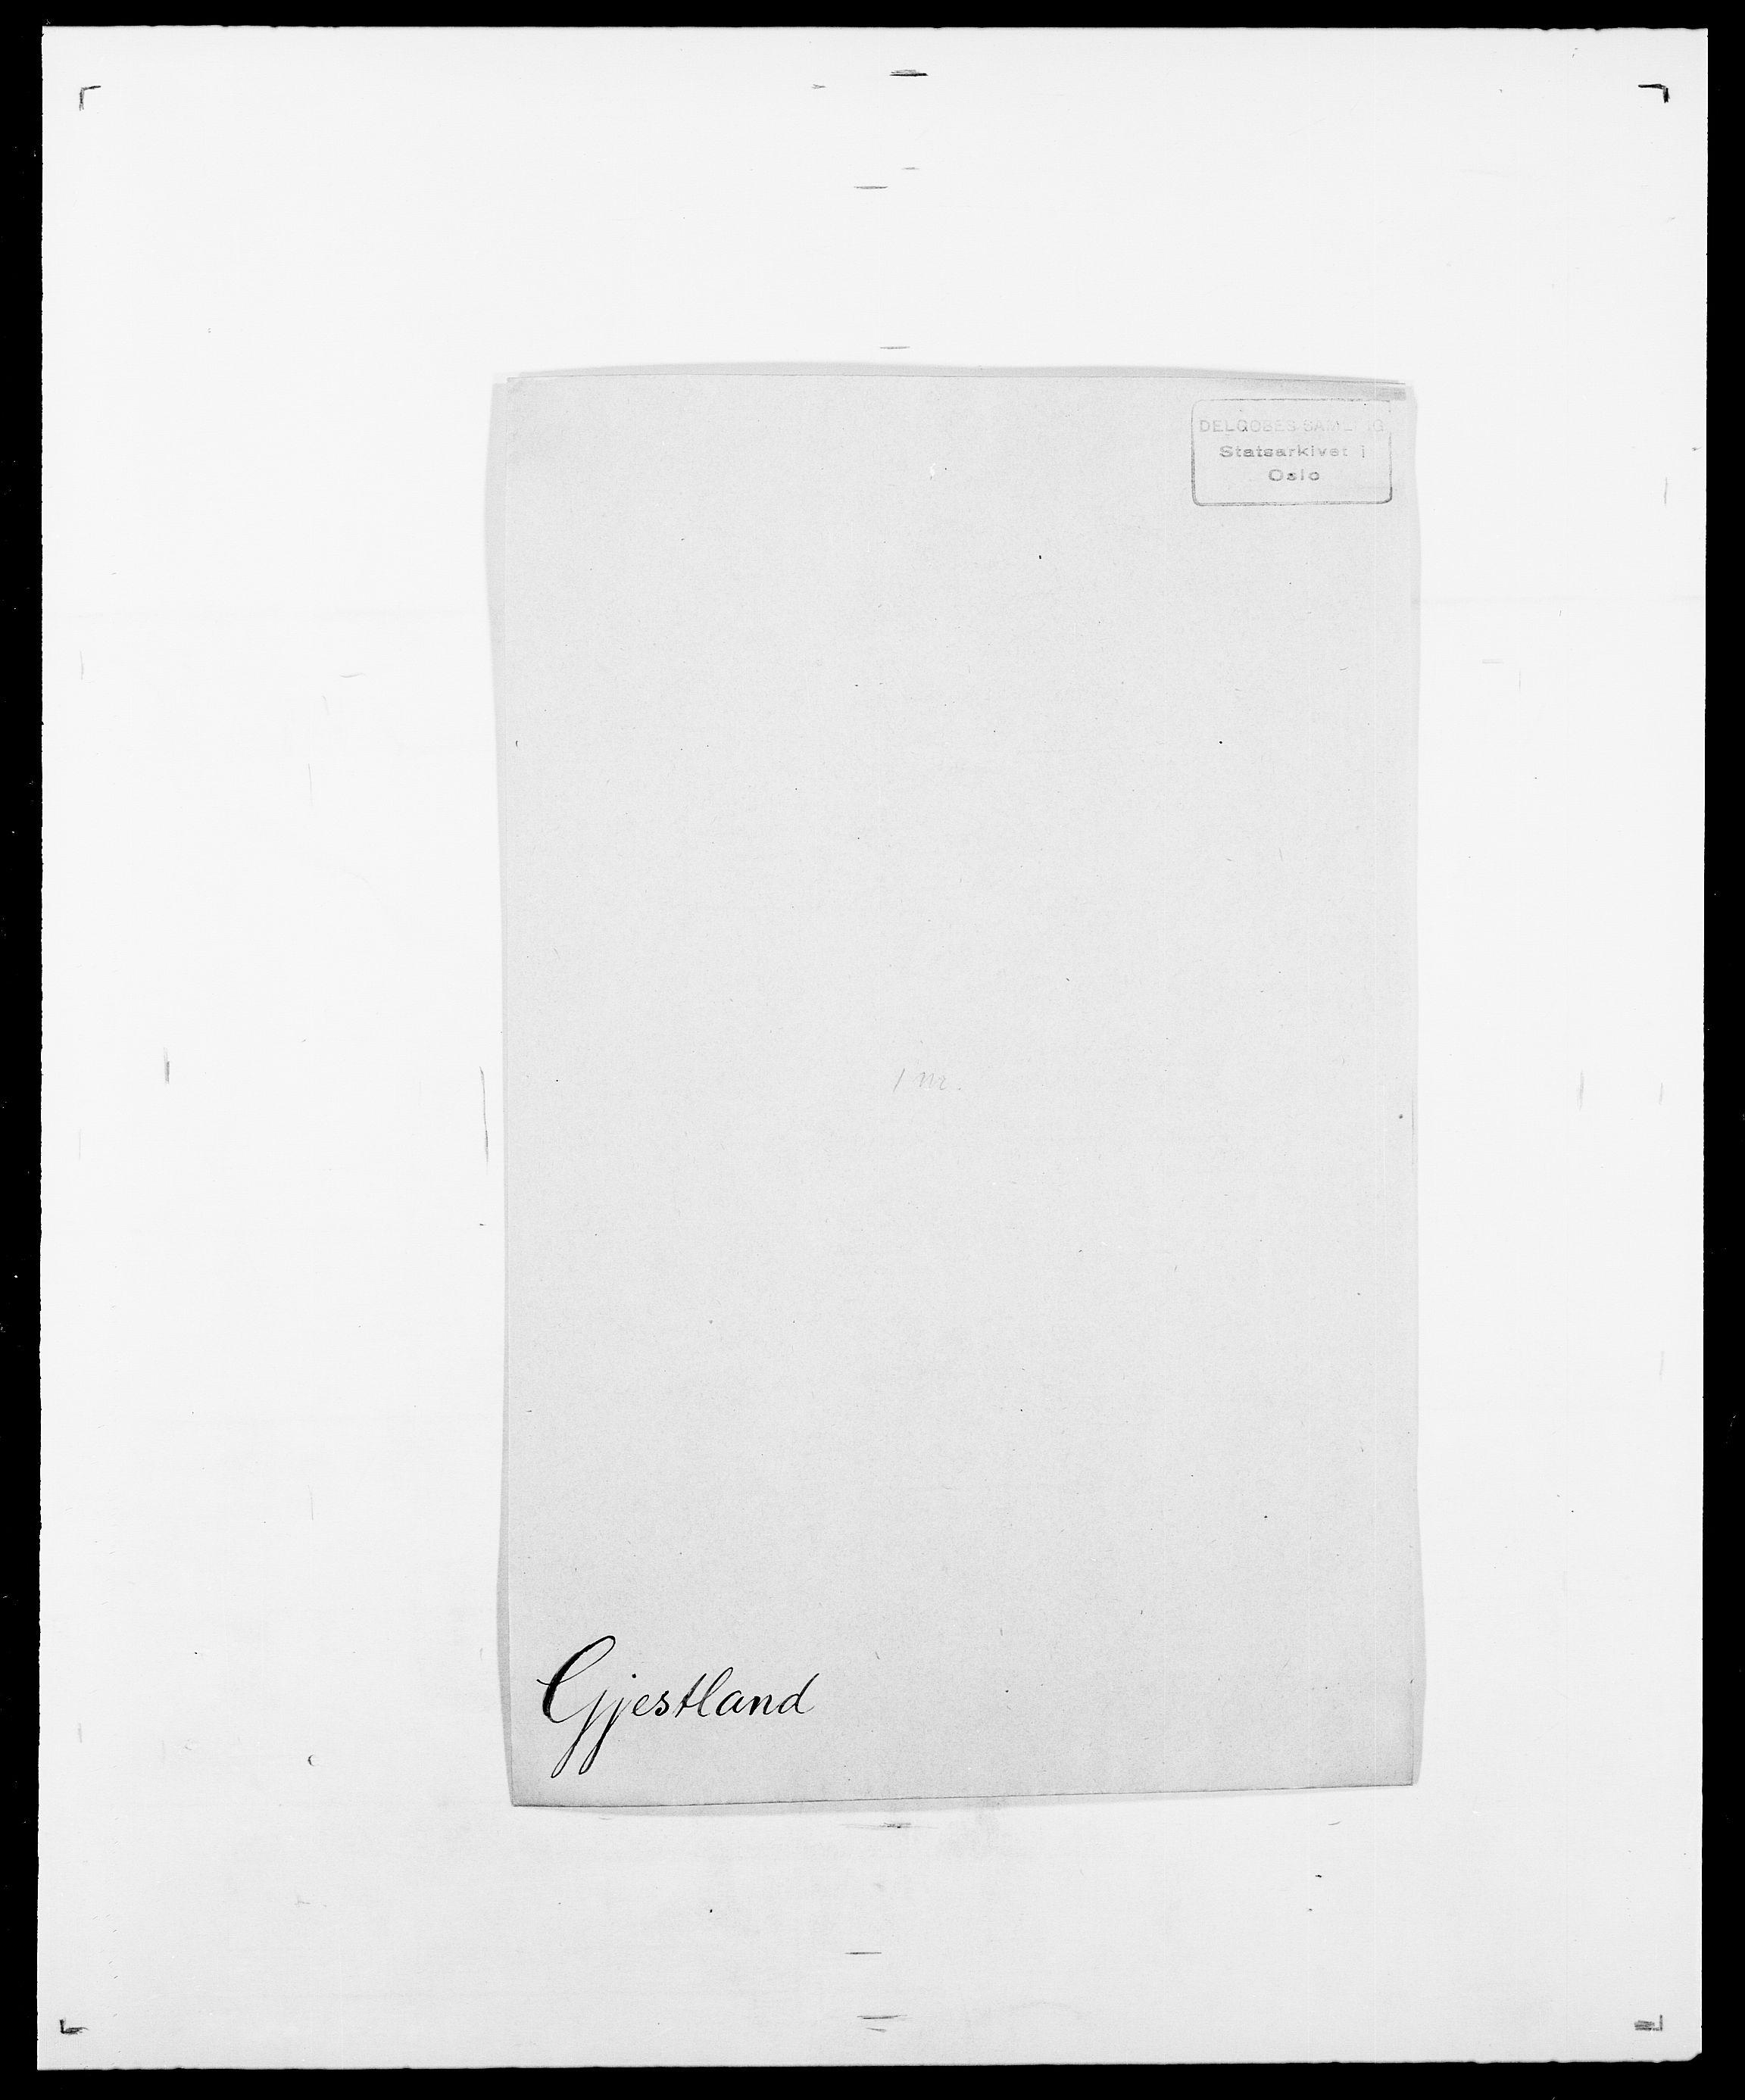 SAO, Delgobe, Charles Antoine - samling, D/Da/L0014: Giebdhausen - Grip, s. 197